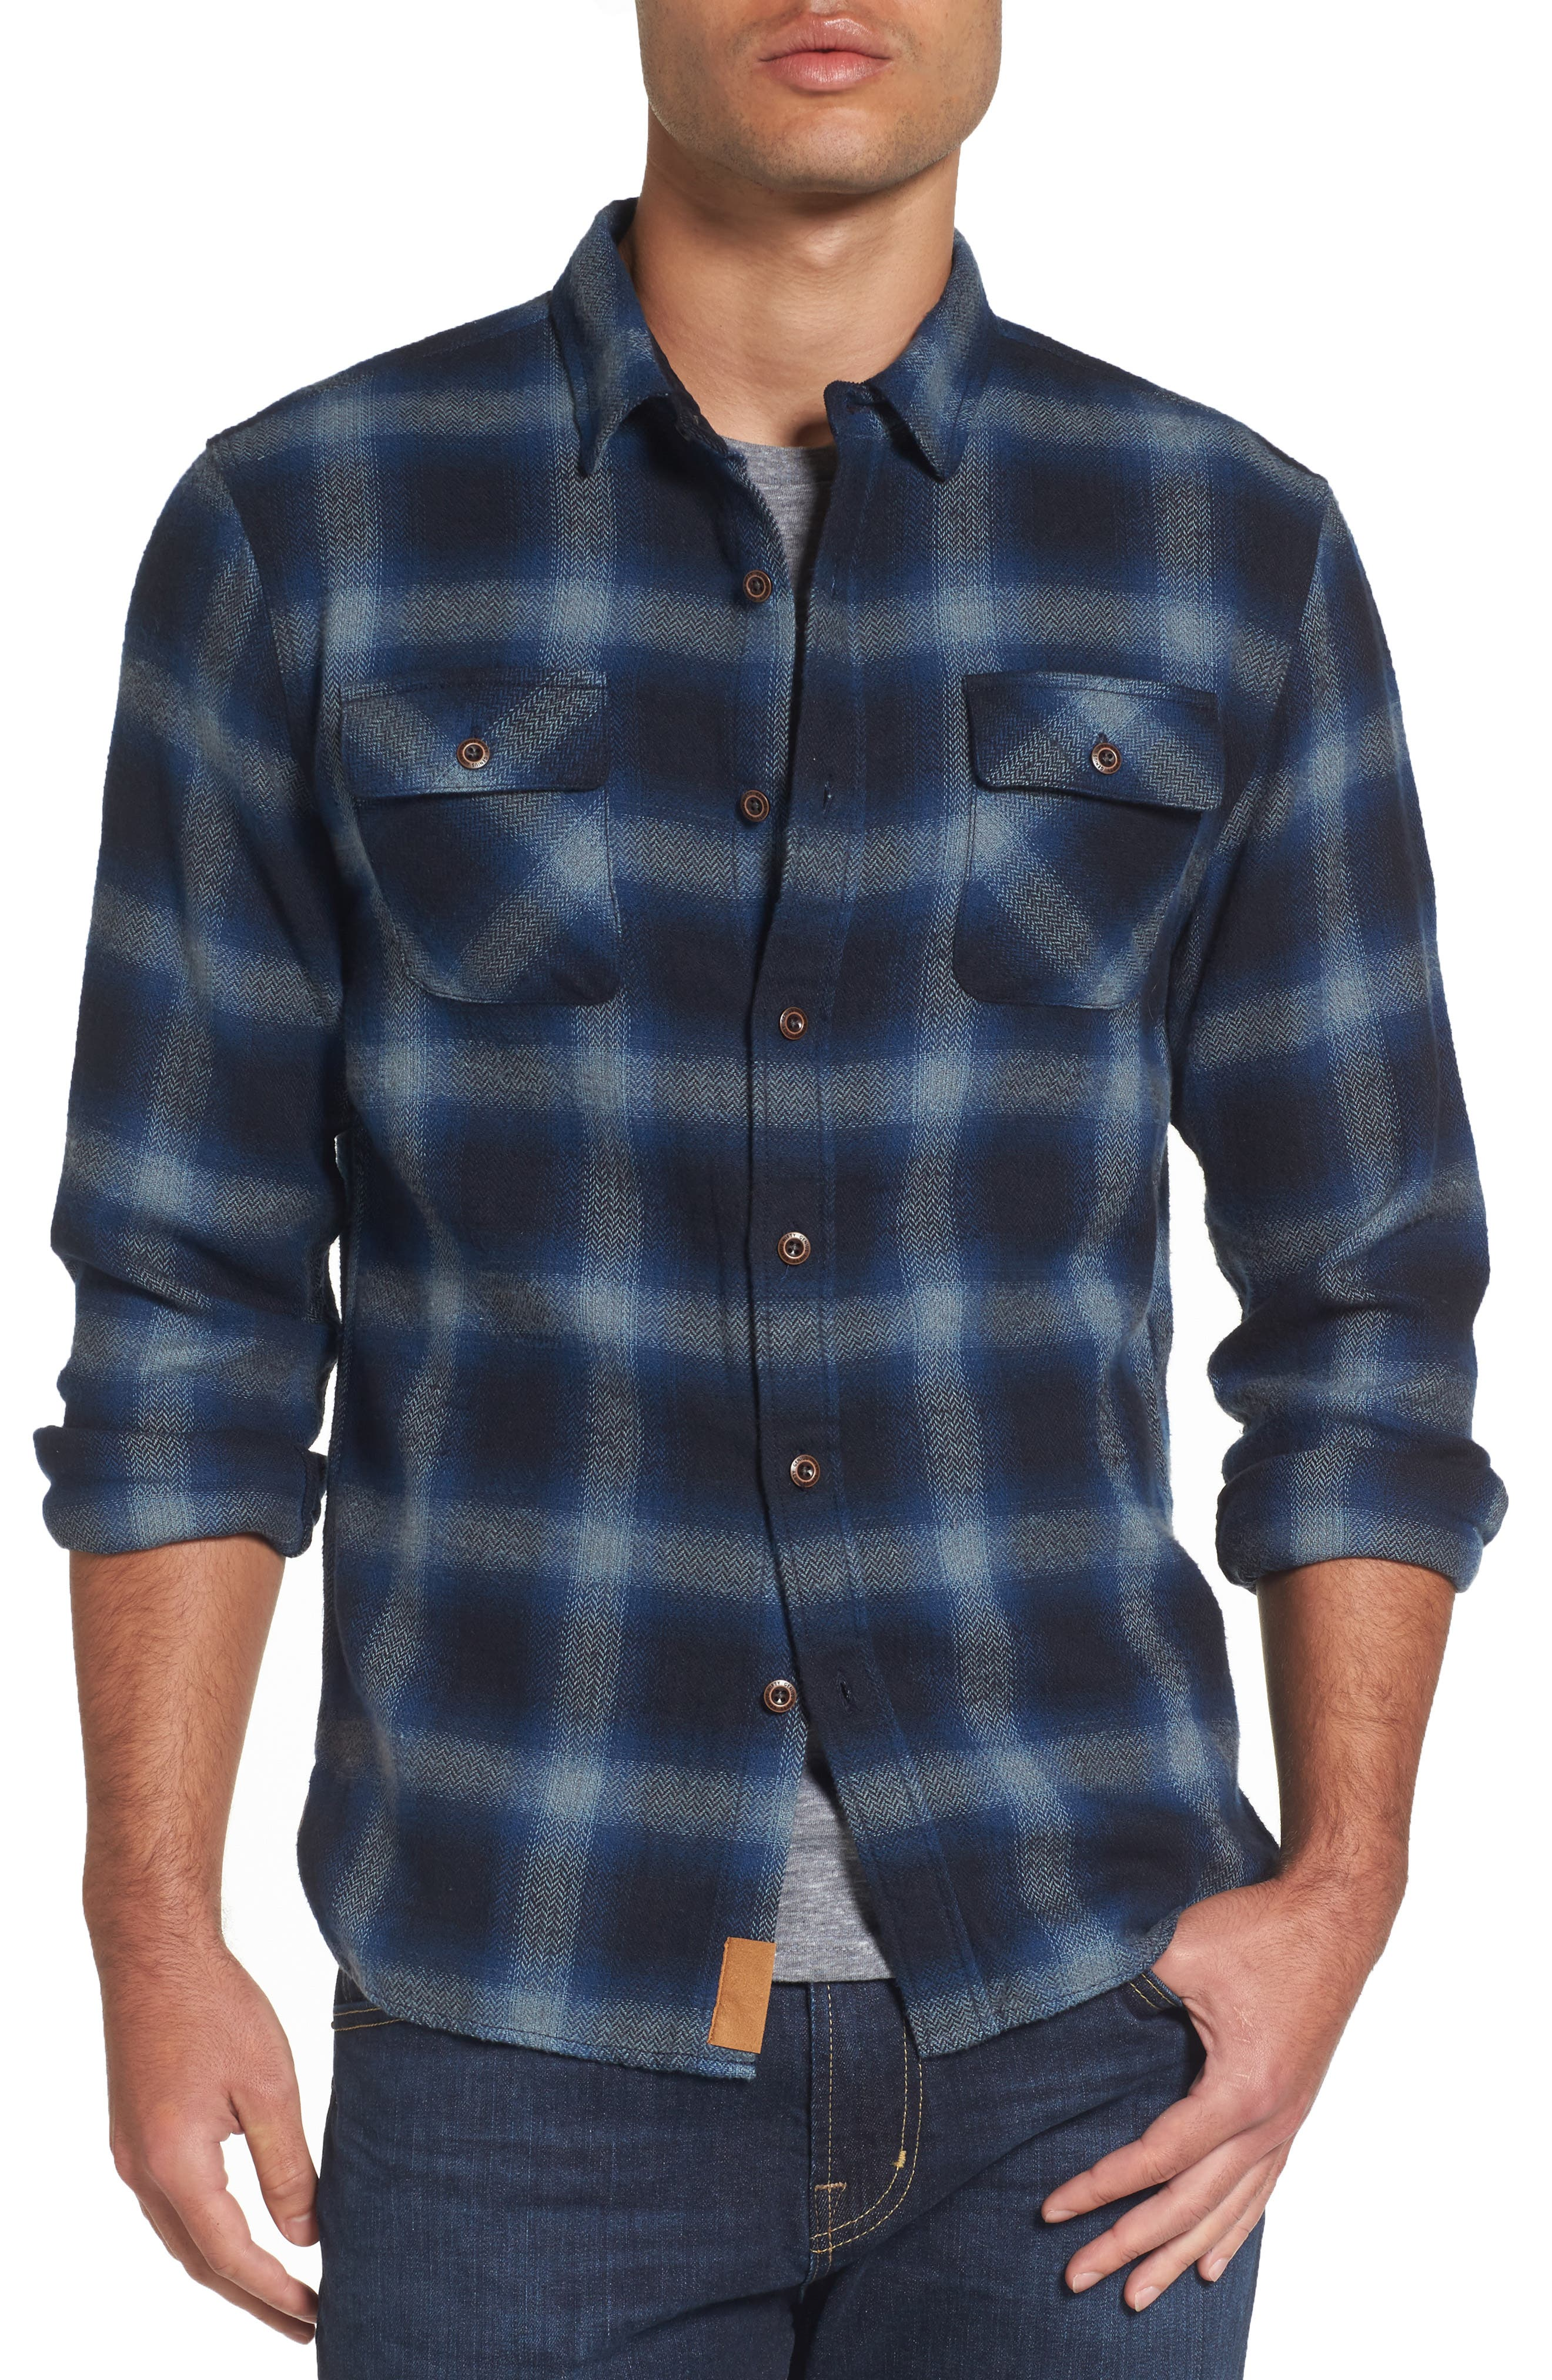 Truman Outdoor Check Sport Shirt,                         Main,                         color, Navy/ Blue